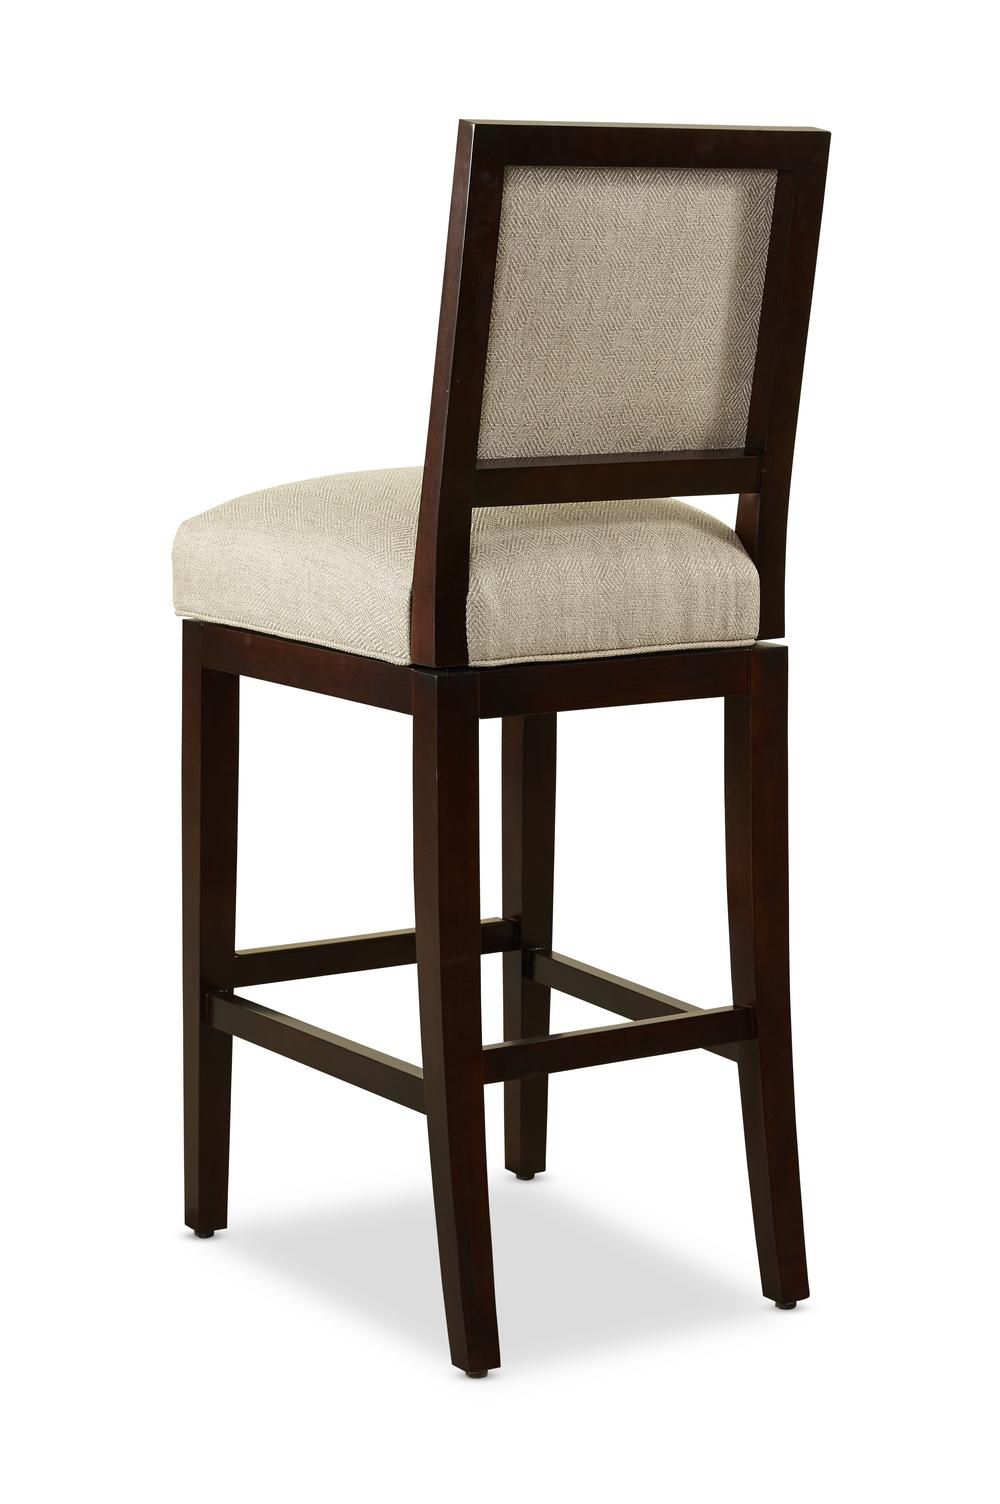 Designmaster Furniture - Geneva Bar Stool